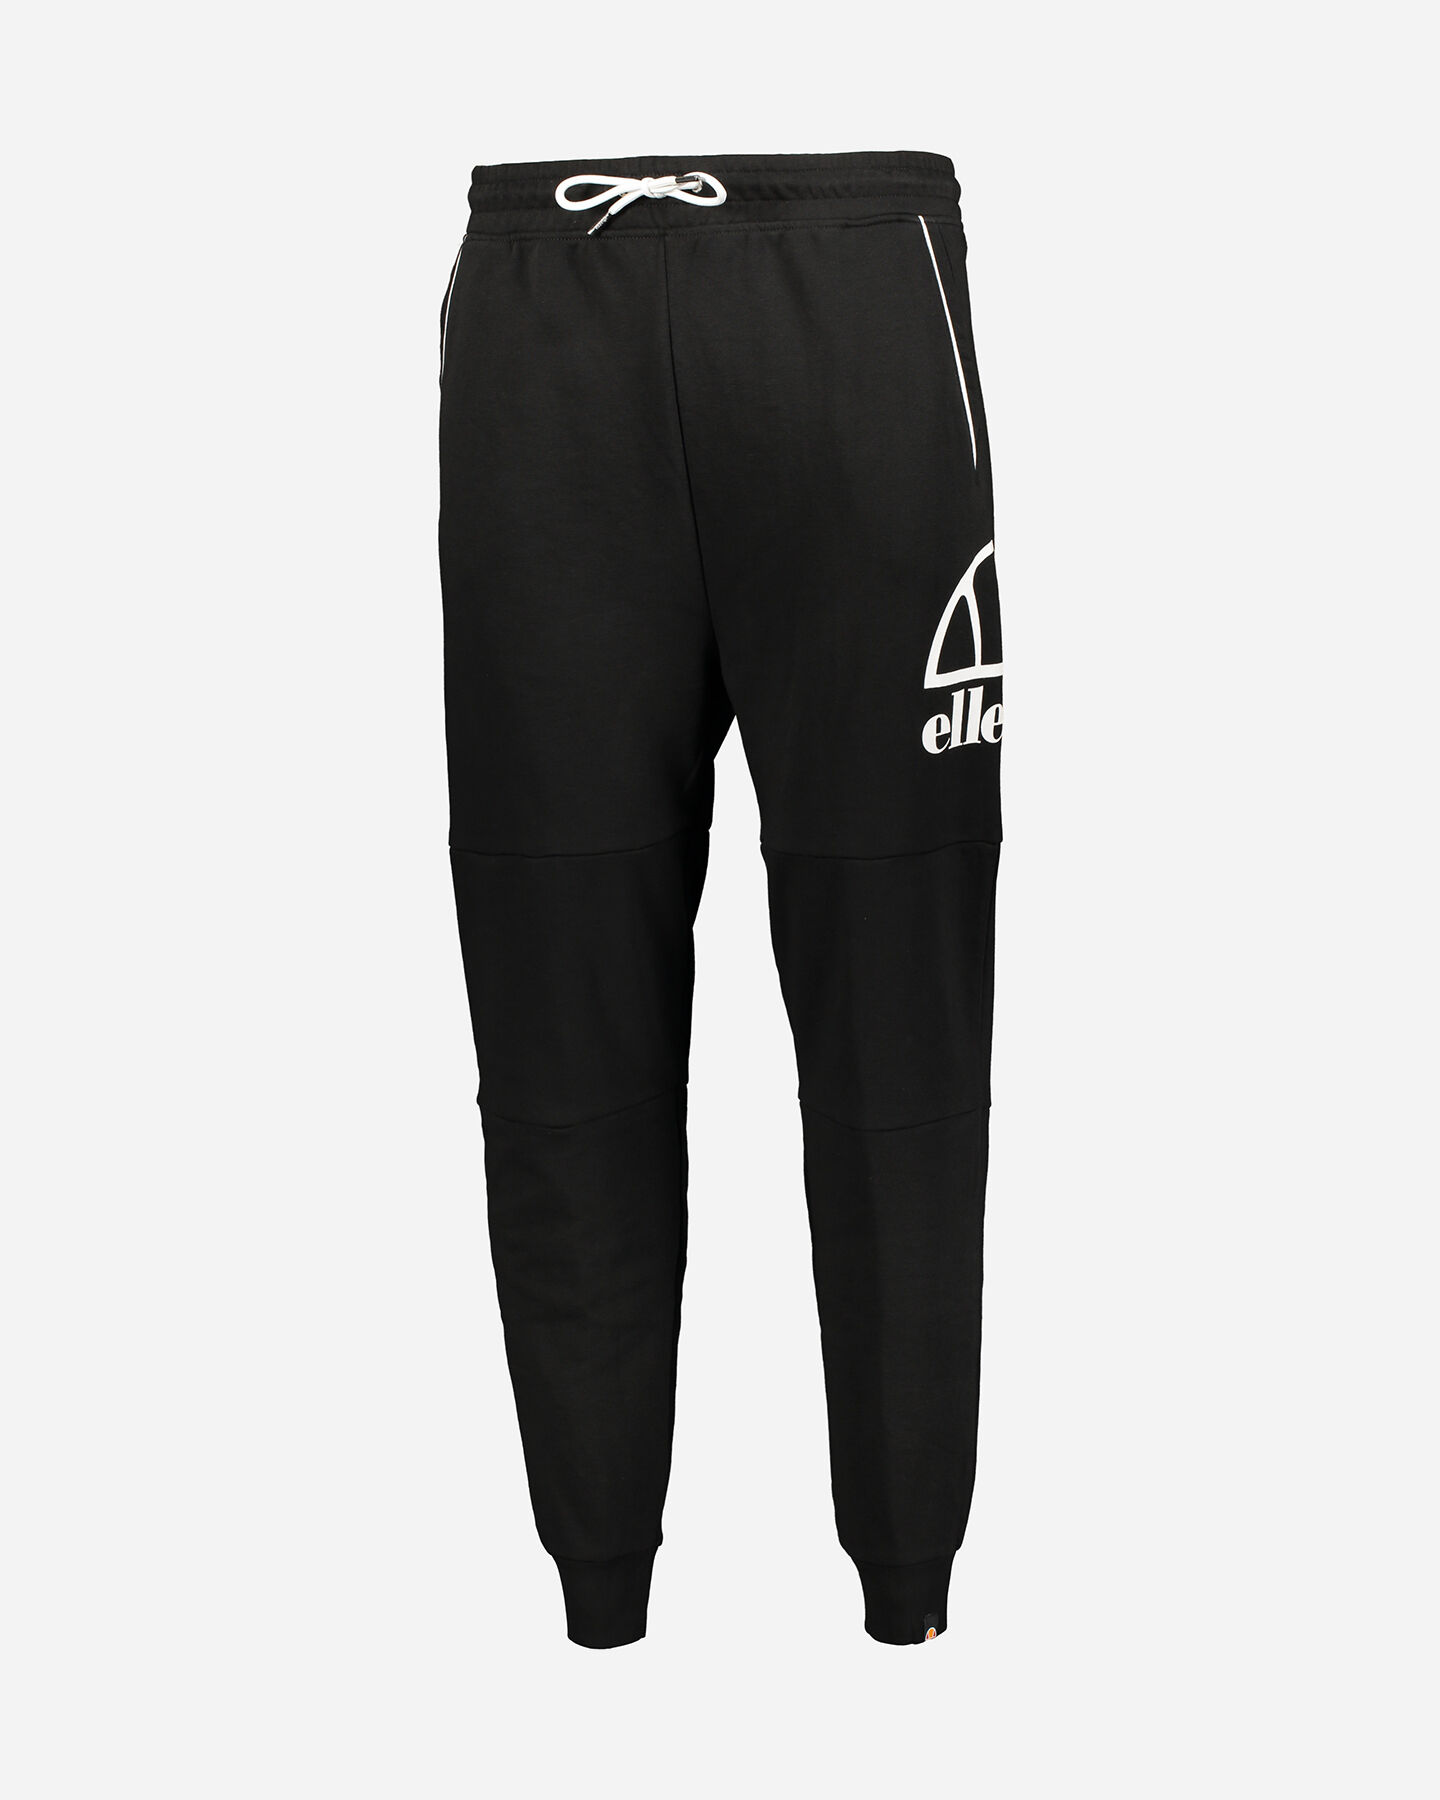 Pantalone ELLESSE LOGO OUTLINE M S4088454 scatto 4